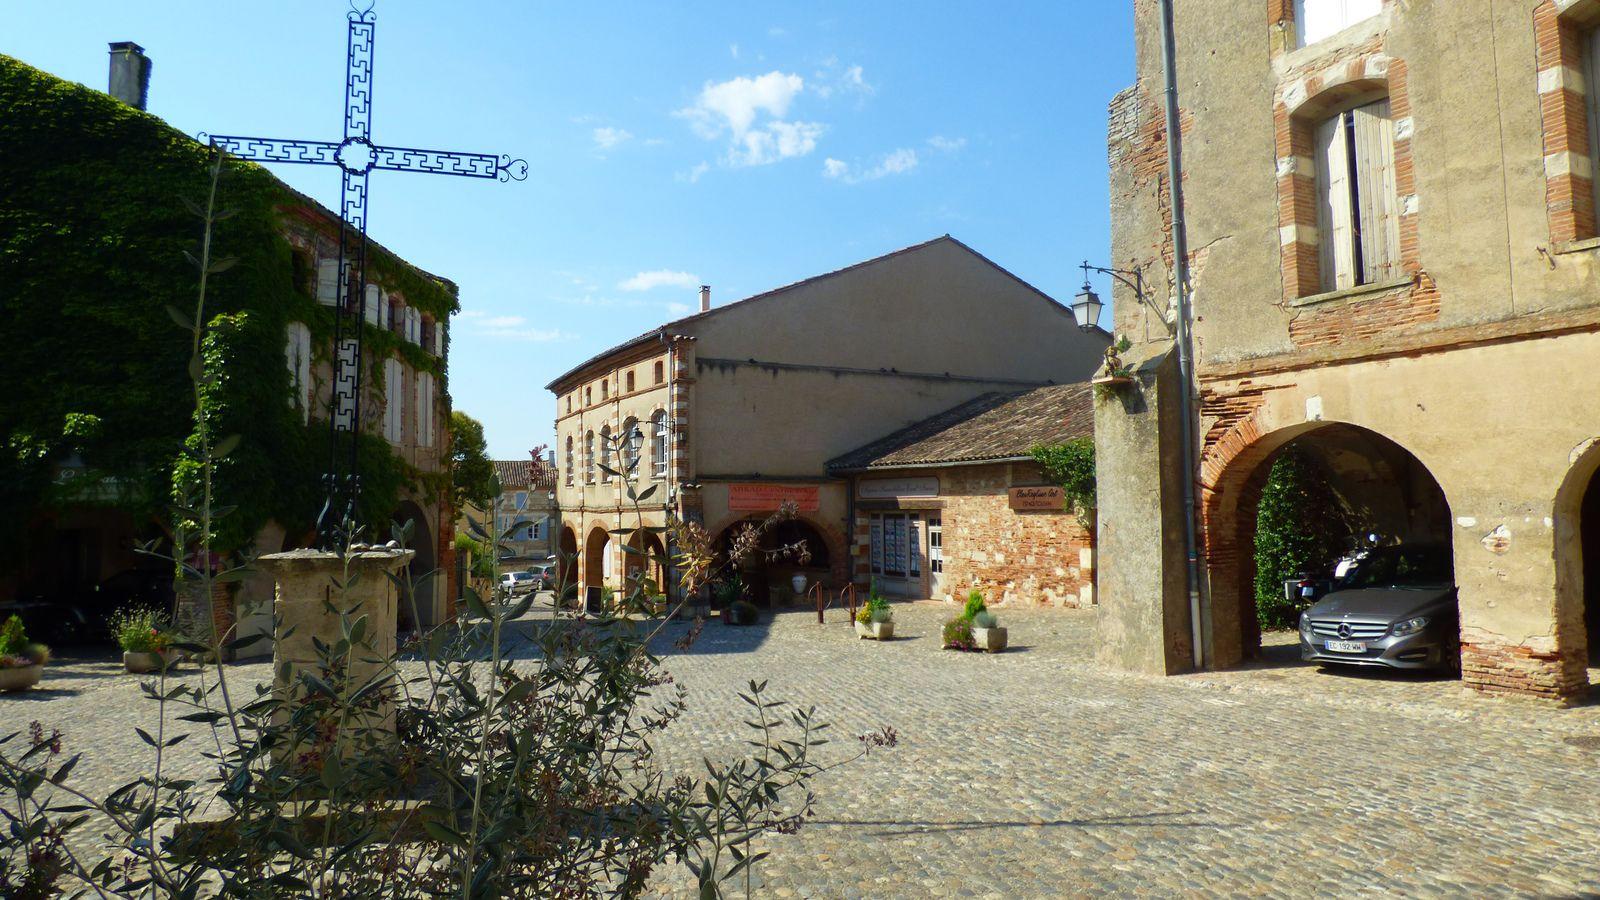 La halle d'Auvillar, village médiéval/ Tarn et Garonne.